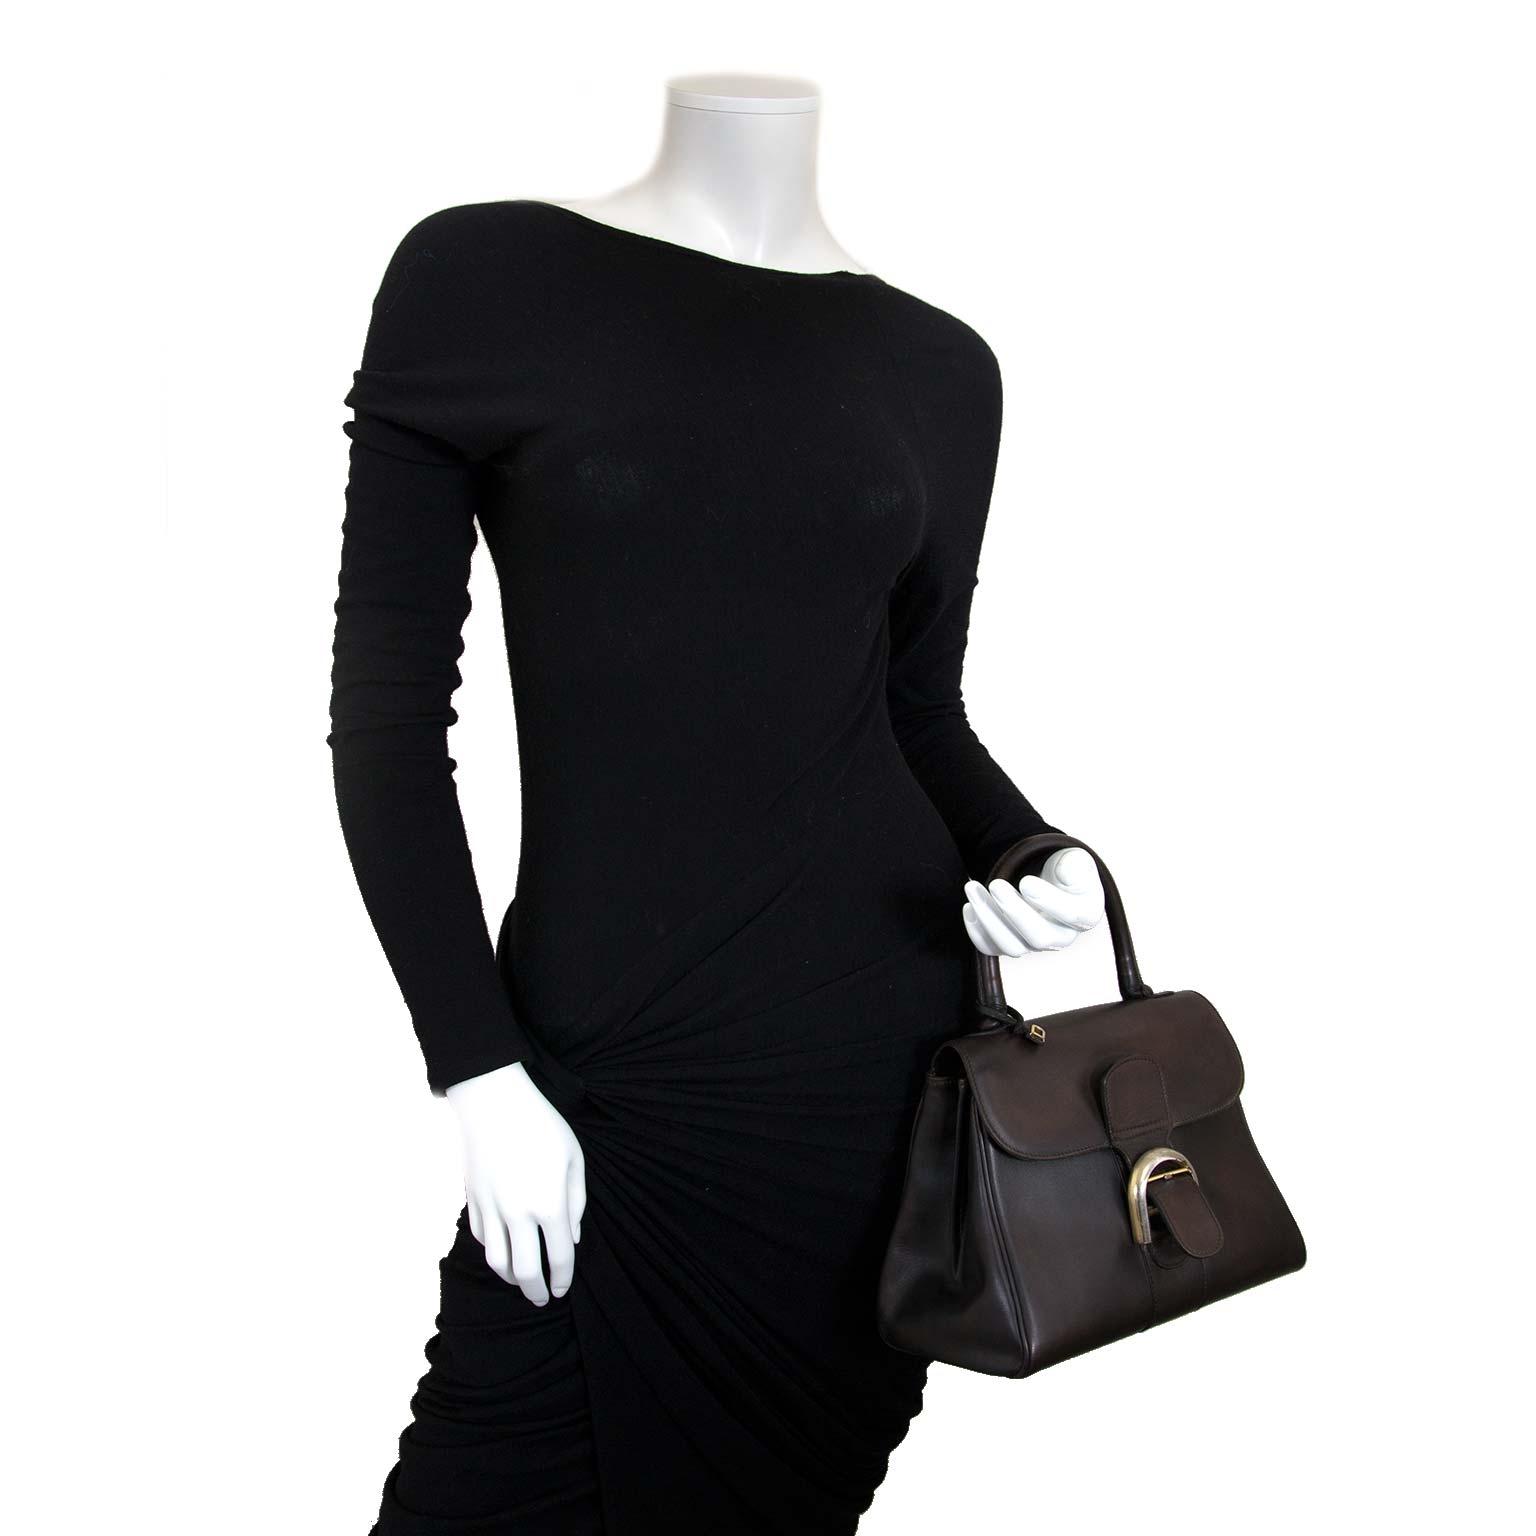 delvaux brillant vintage bruine pm tas nu te koop bij labellov vintage mode webshop belgië